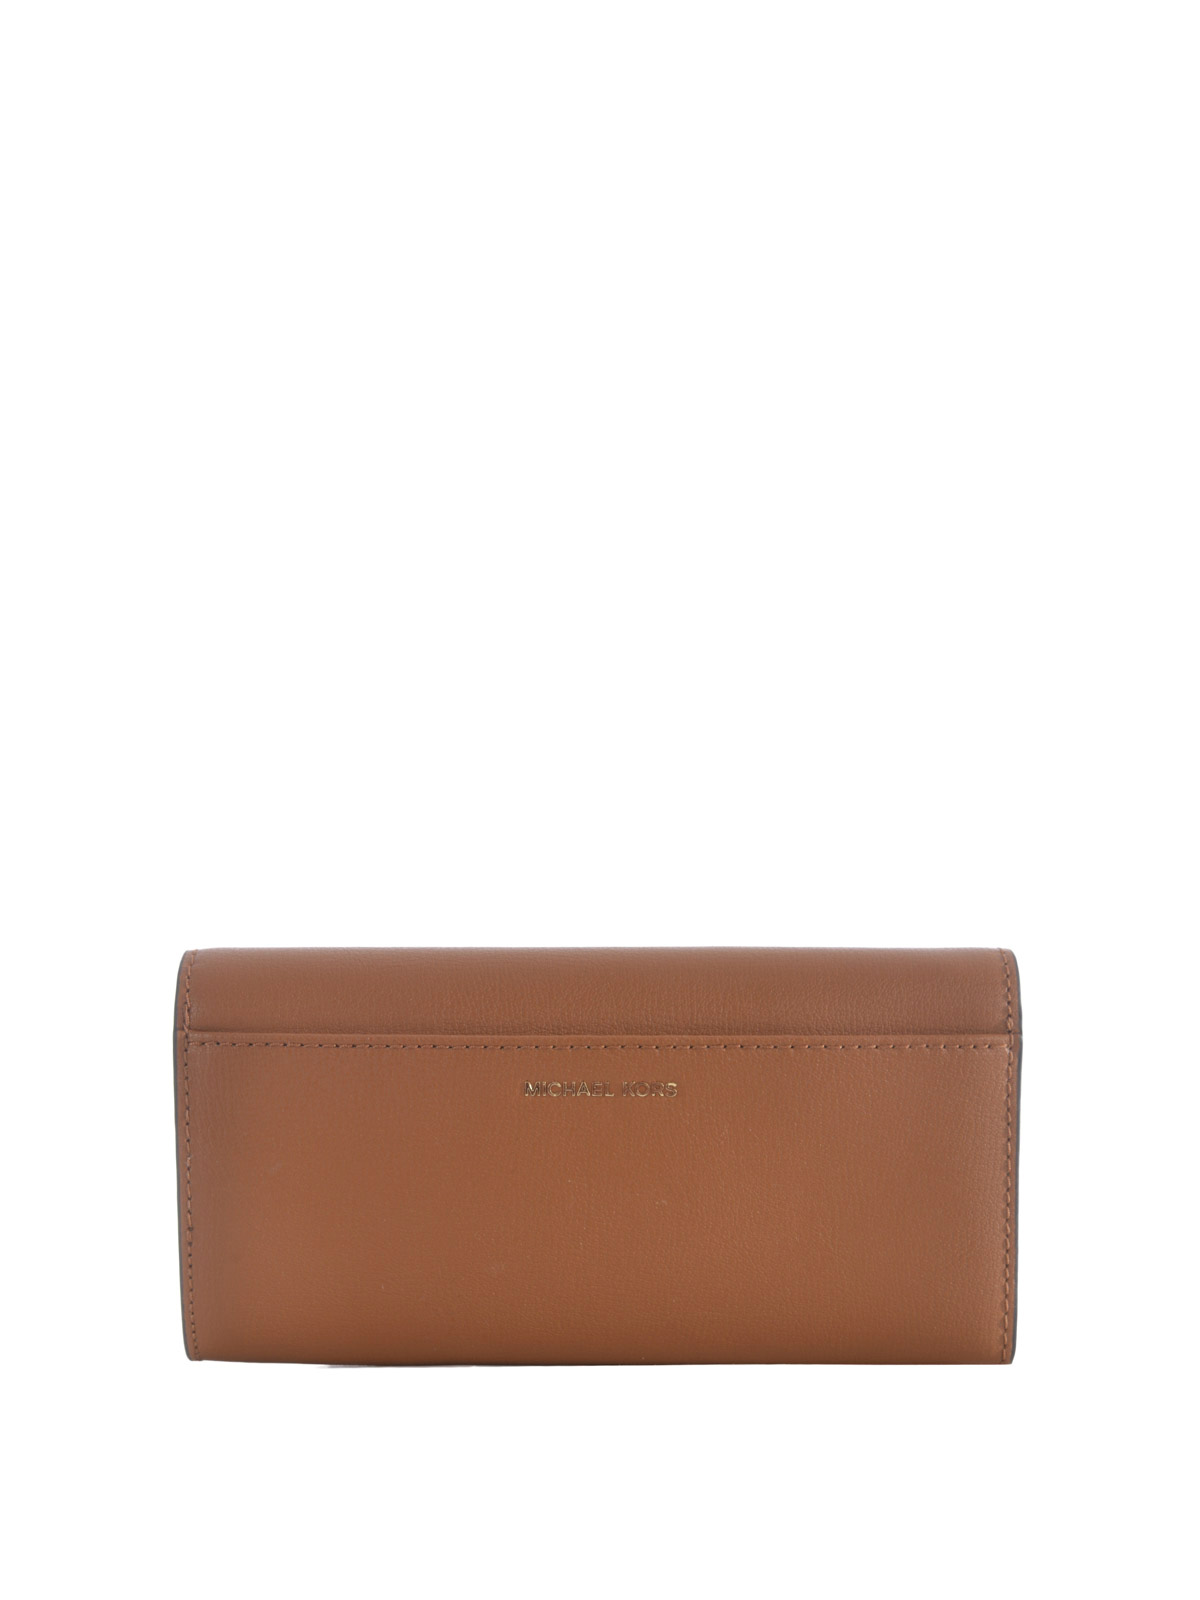 fd34ddf09e0b iKRIX MICHAEL KORS: wallets & purses - Rivington Stud leather flap wallet